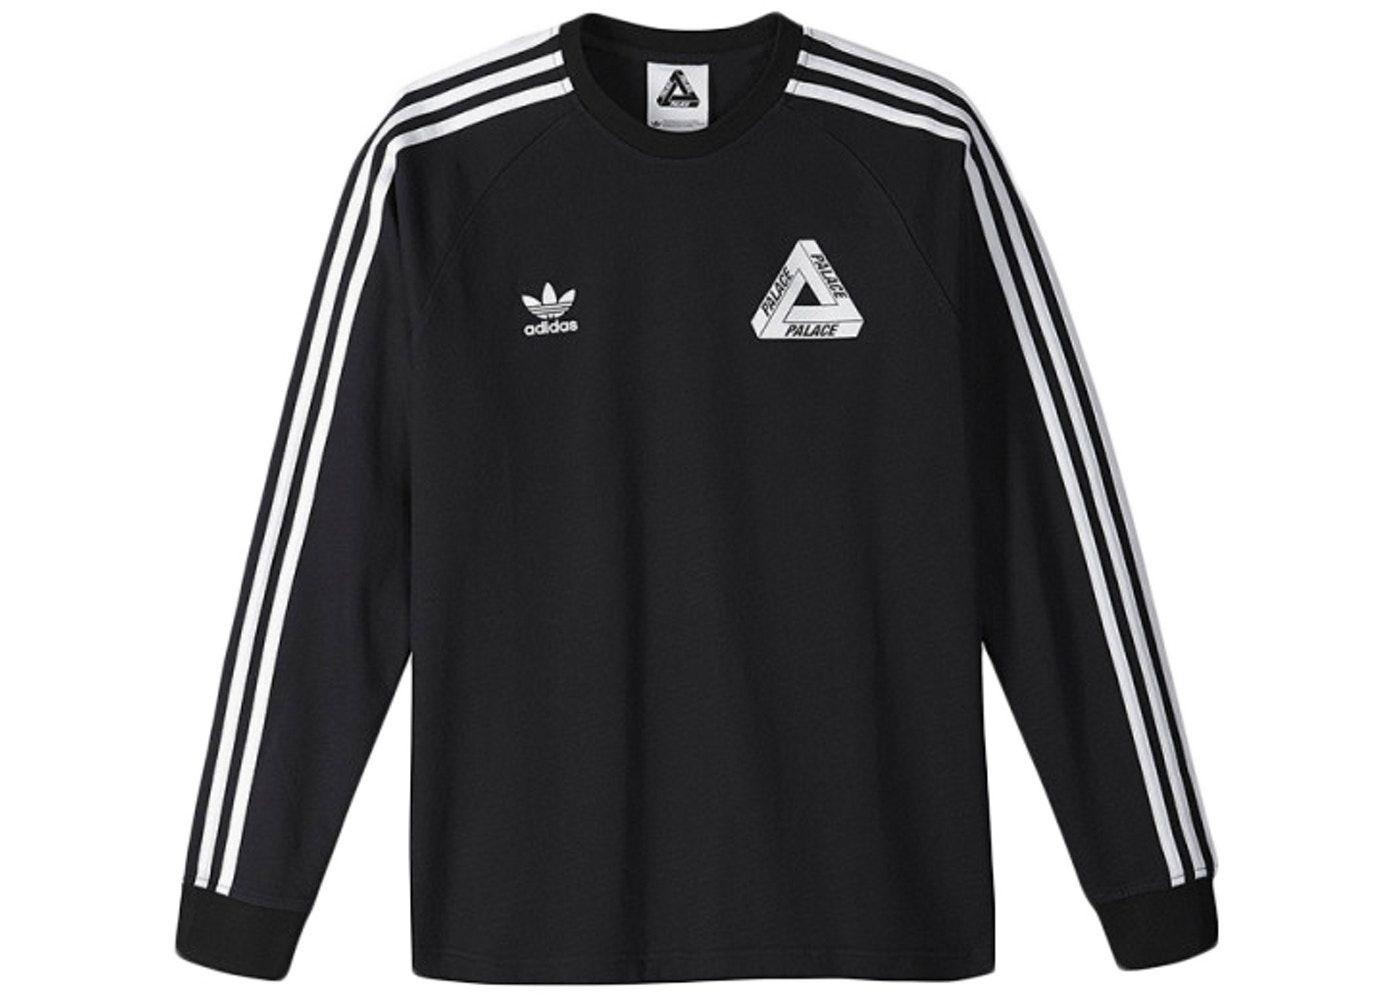 Palace Adidas Longsleeve Team Shirt Black En 2021 Ropa Compras Cosas Para Comprar [ 1000 x 1400 Pixel ]